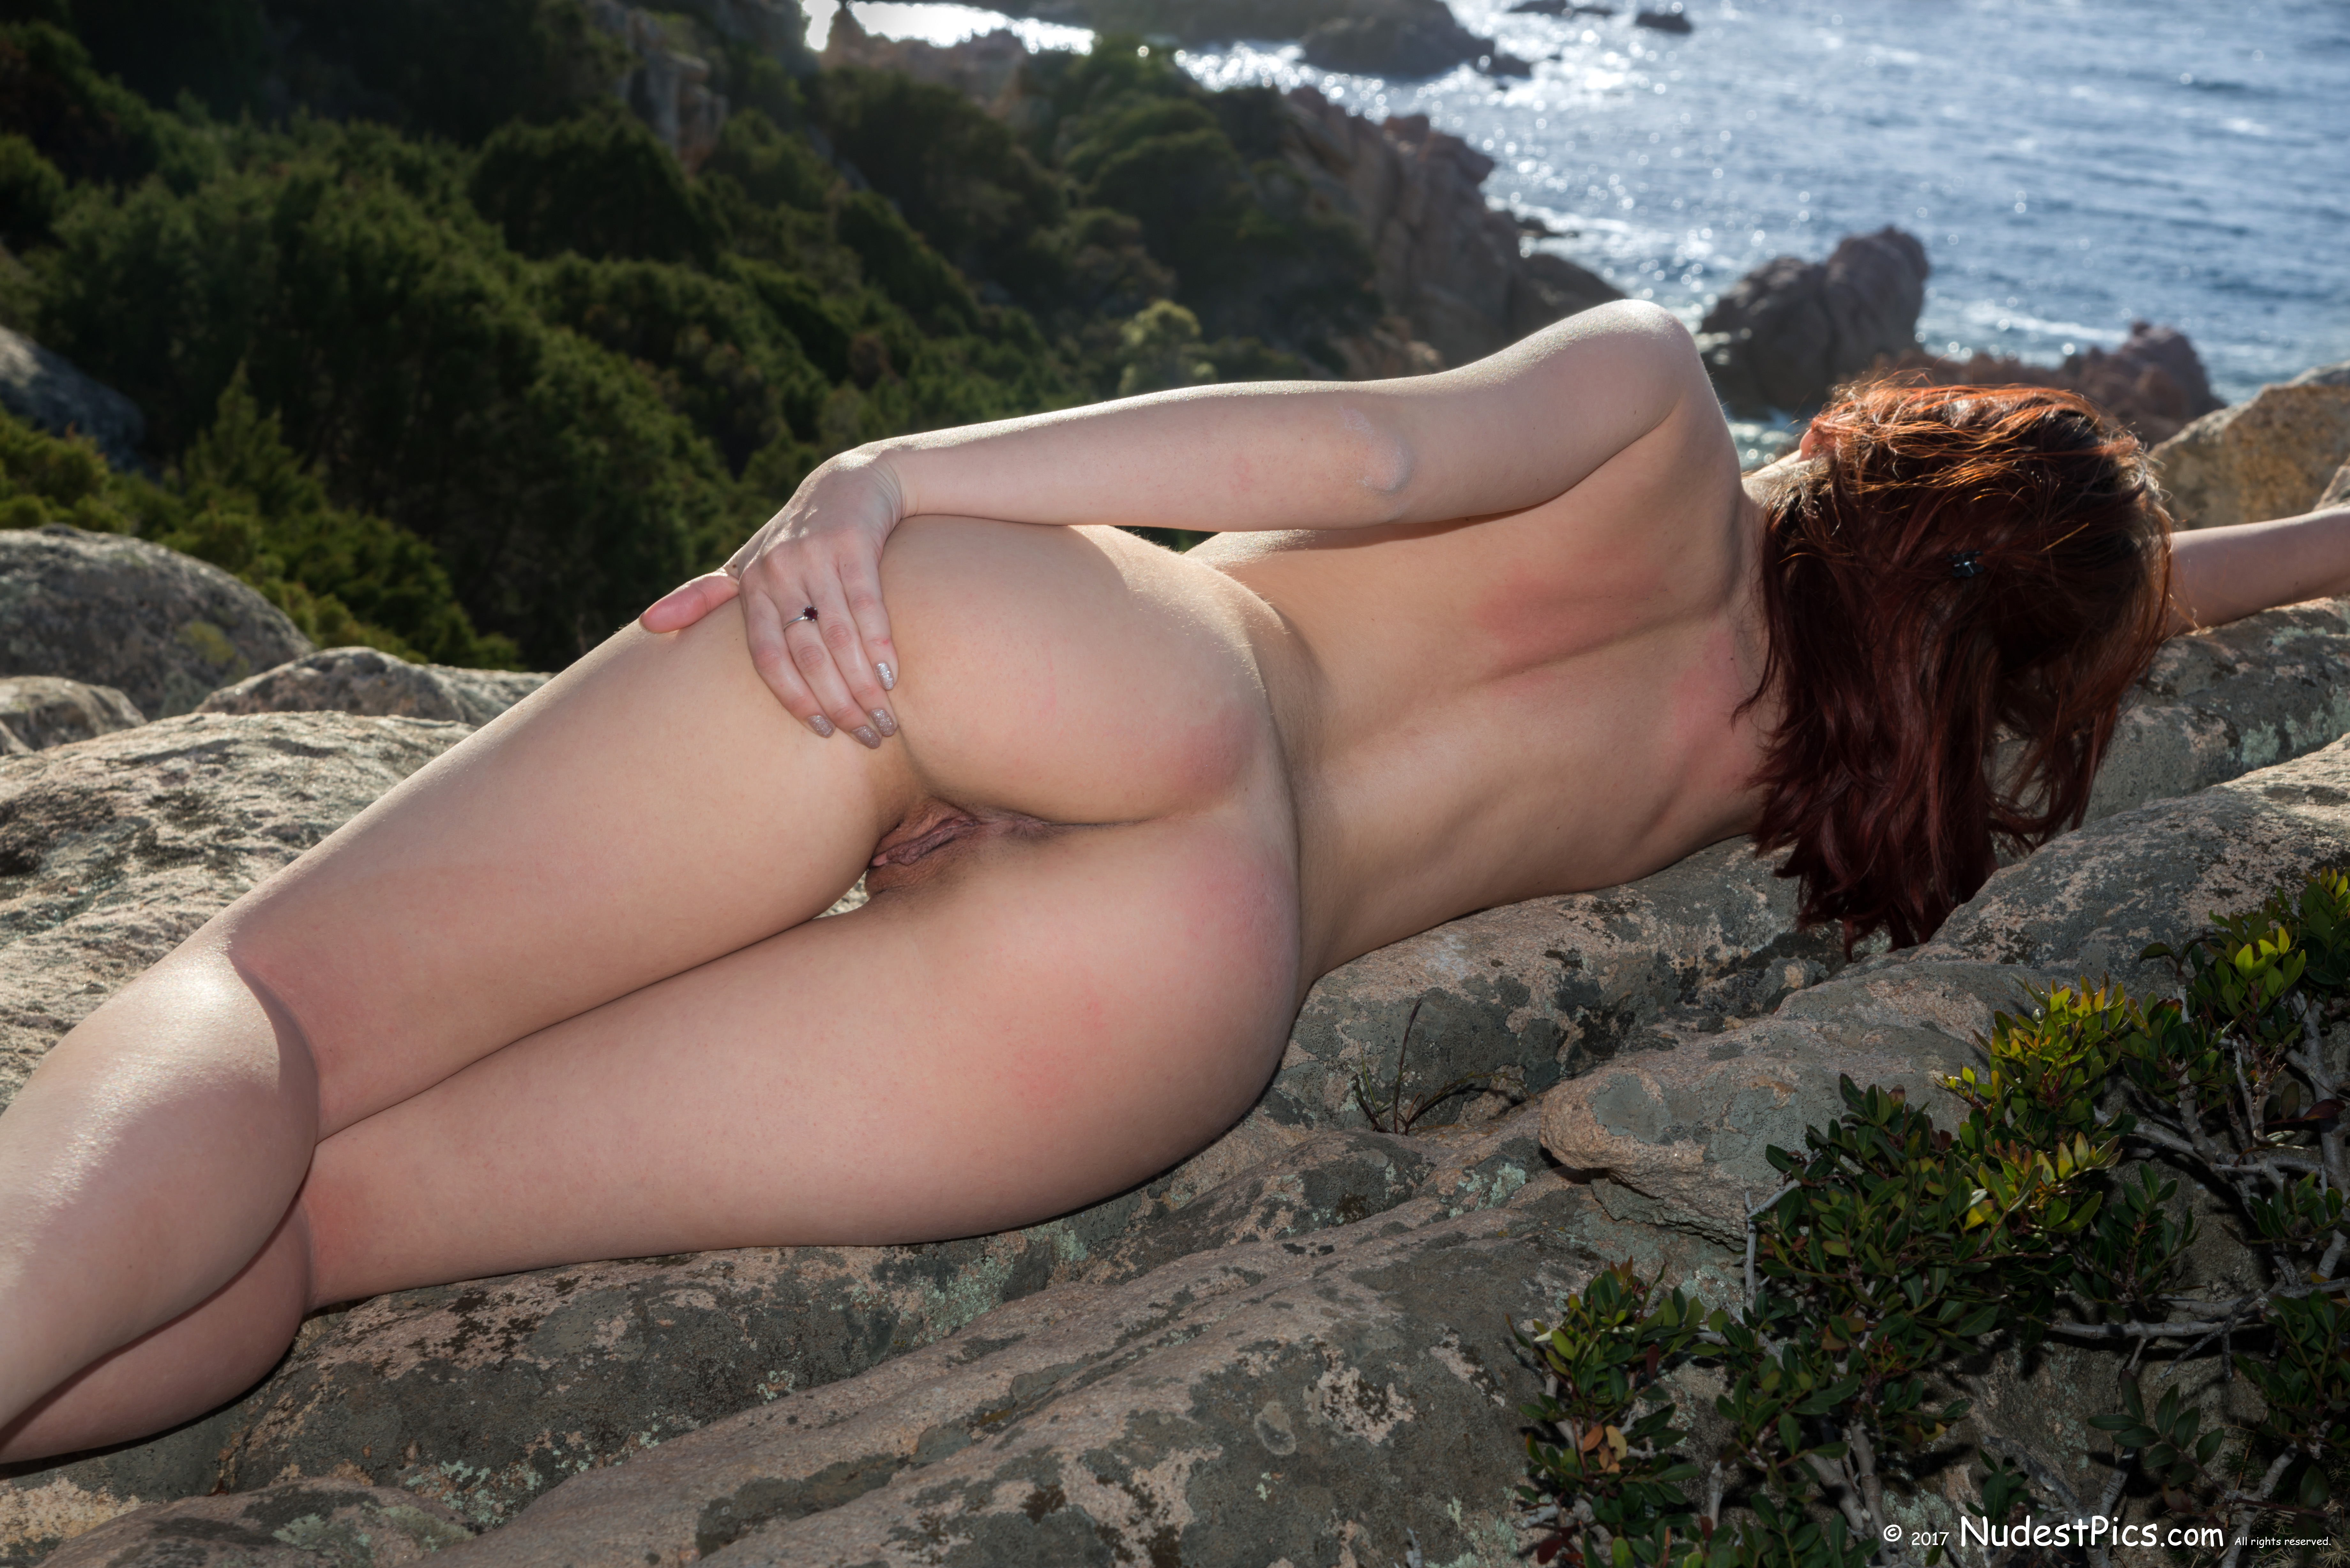 Naughty Nudist Spreading Ass Sunbathing on Rocks